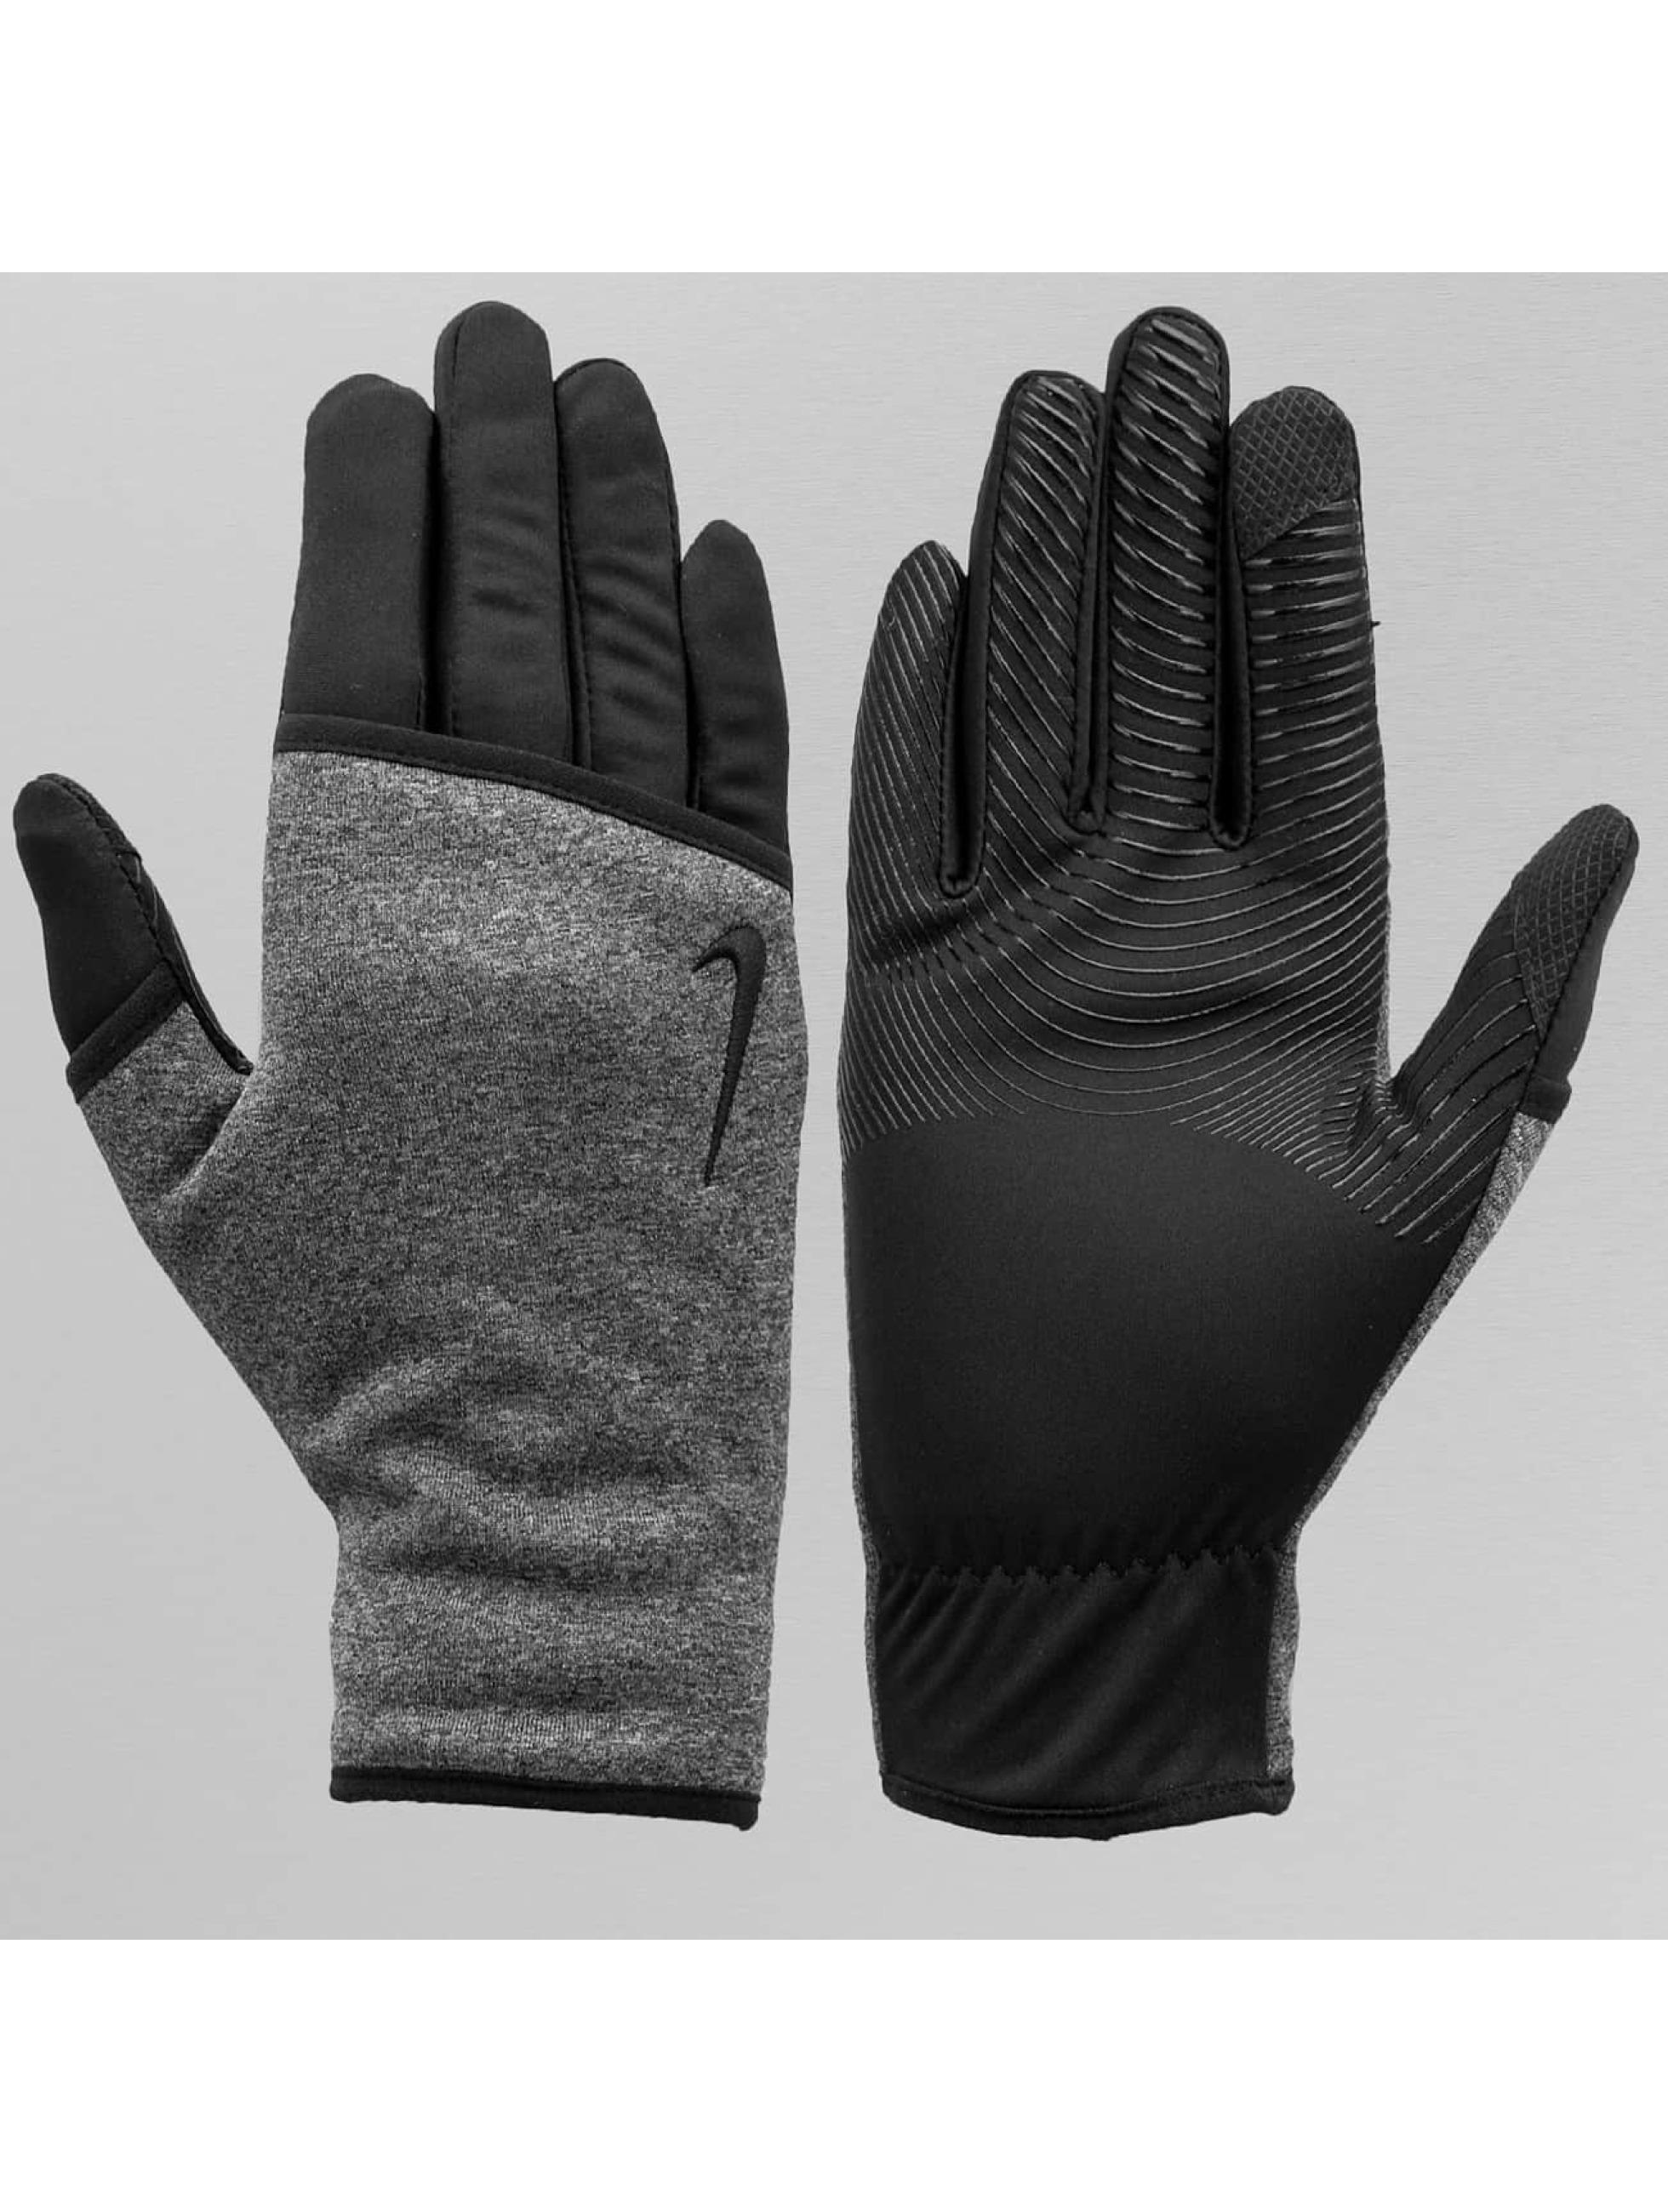 Nike Performance Glove Womens Sphere black